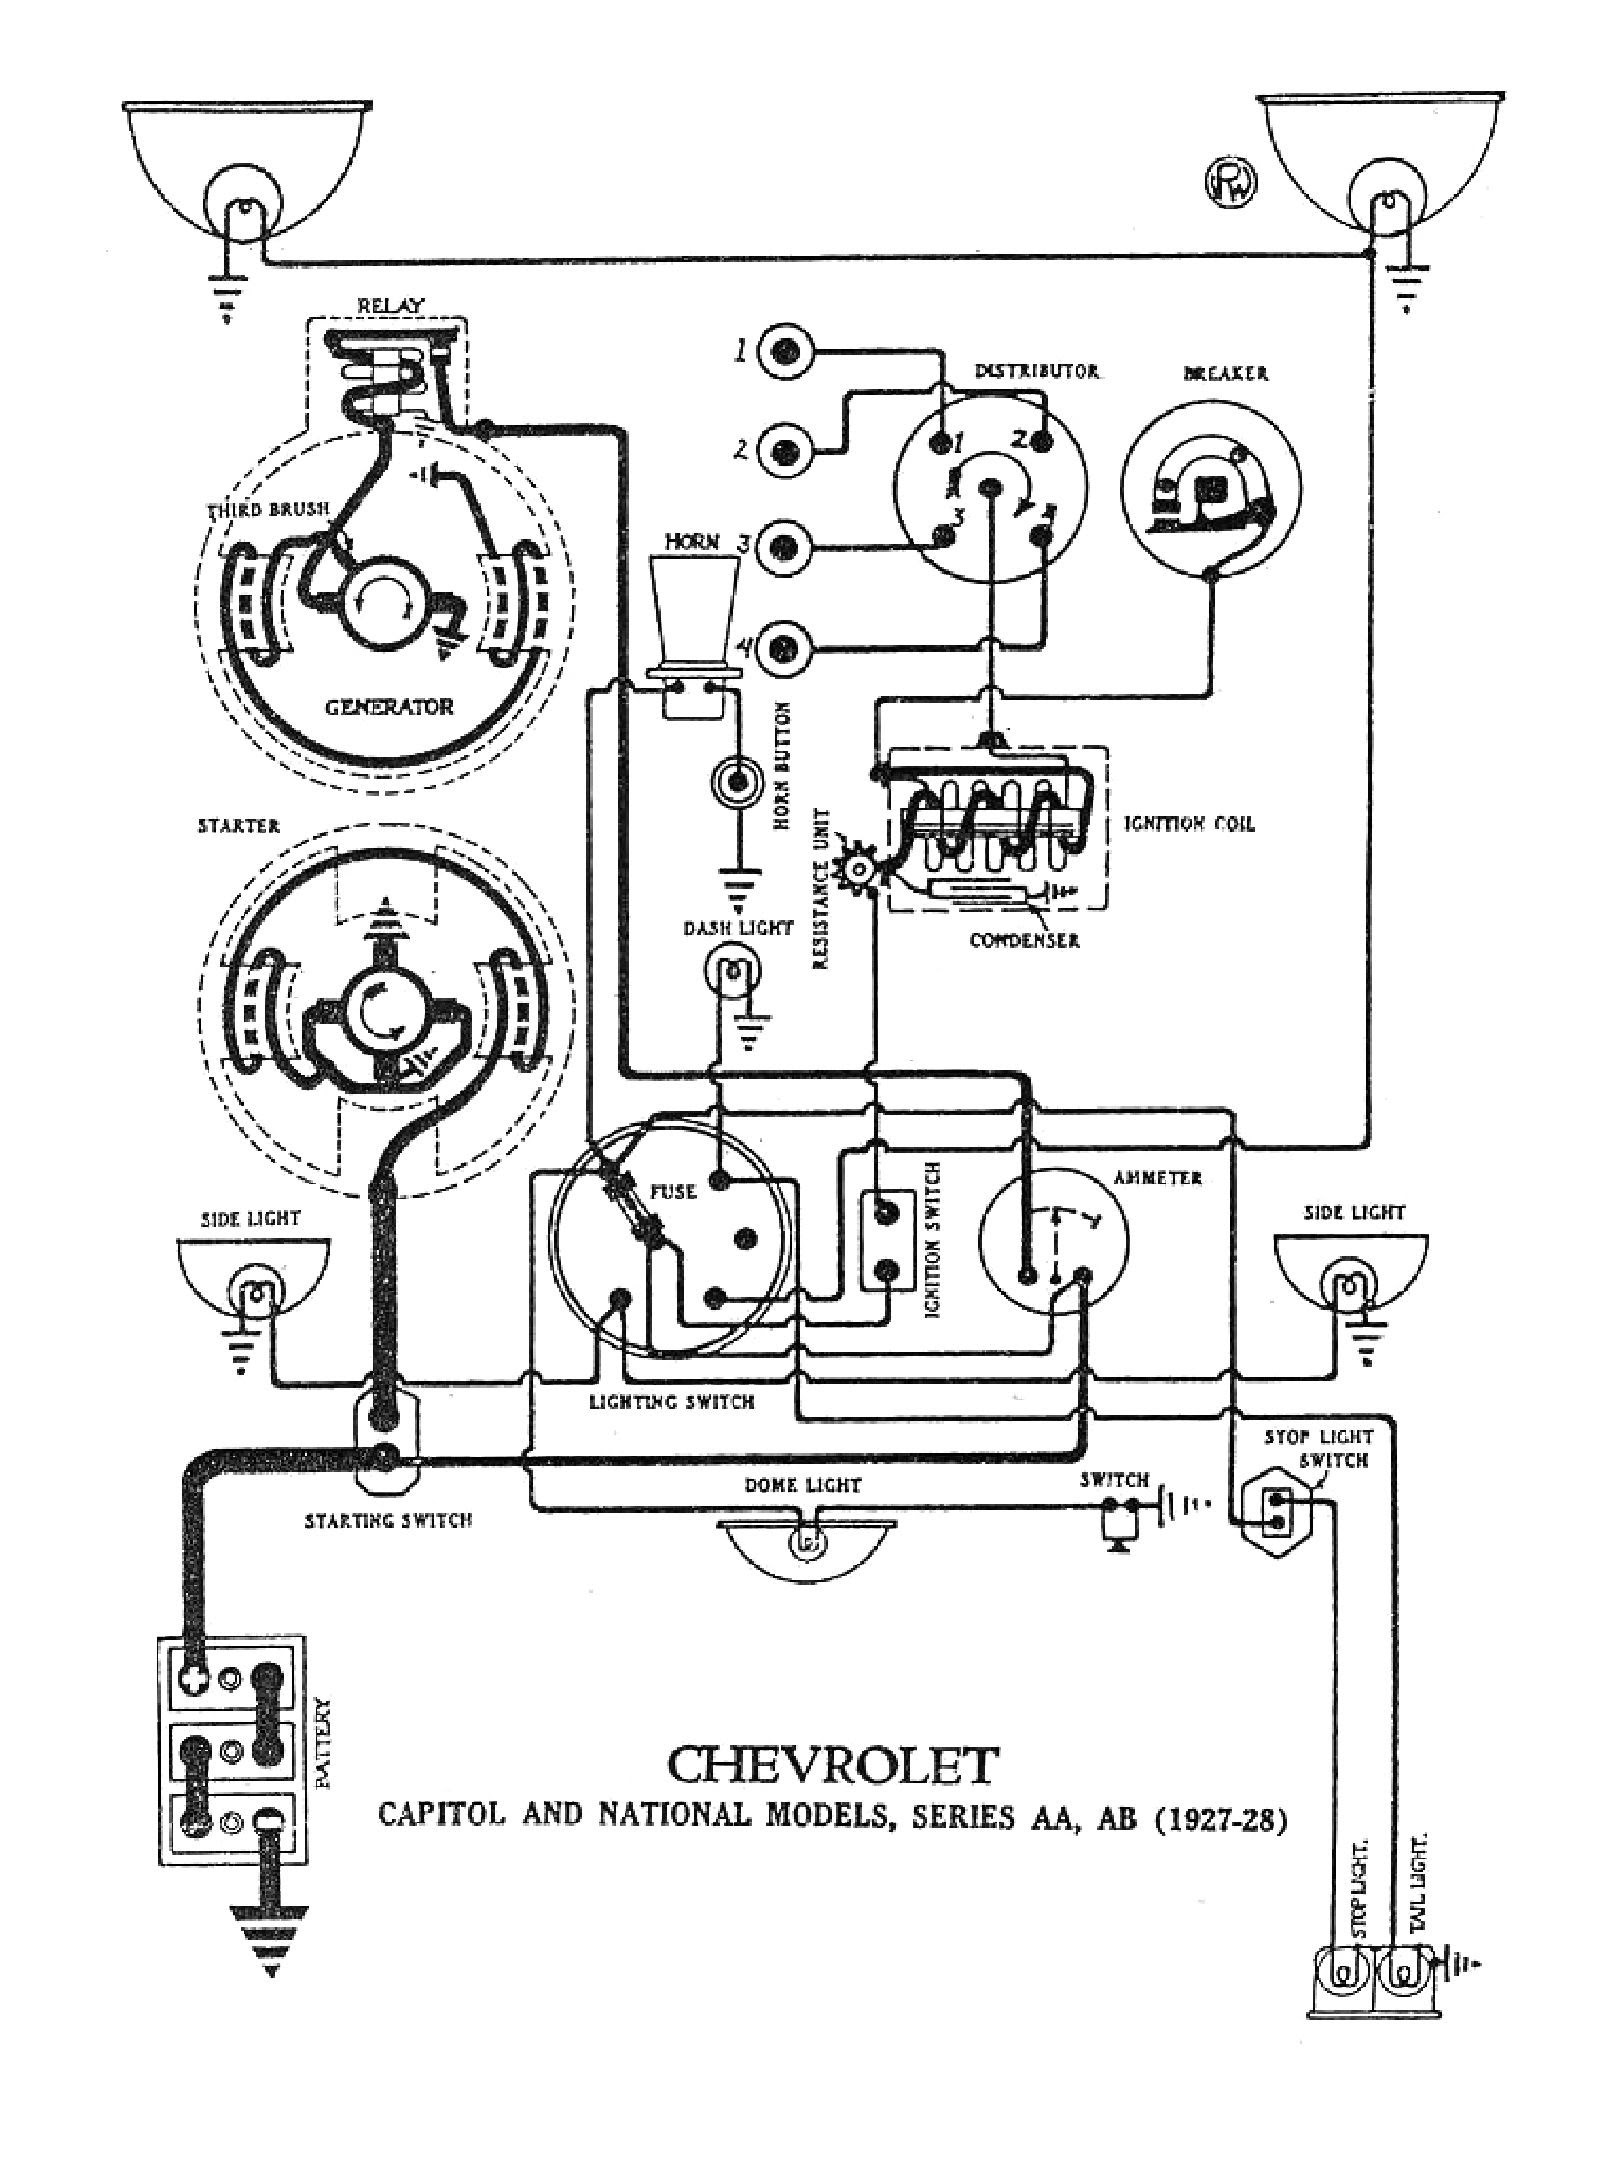 Ford Model T Wiring Diagram - Wiring Diagram | Tudor 1925 Ford Model T Wiring Diagram |  | Wiring Diagram